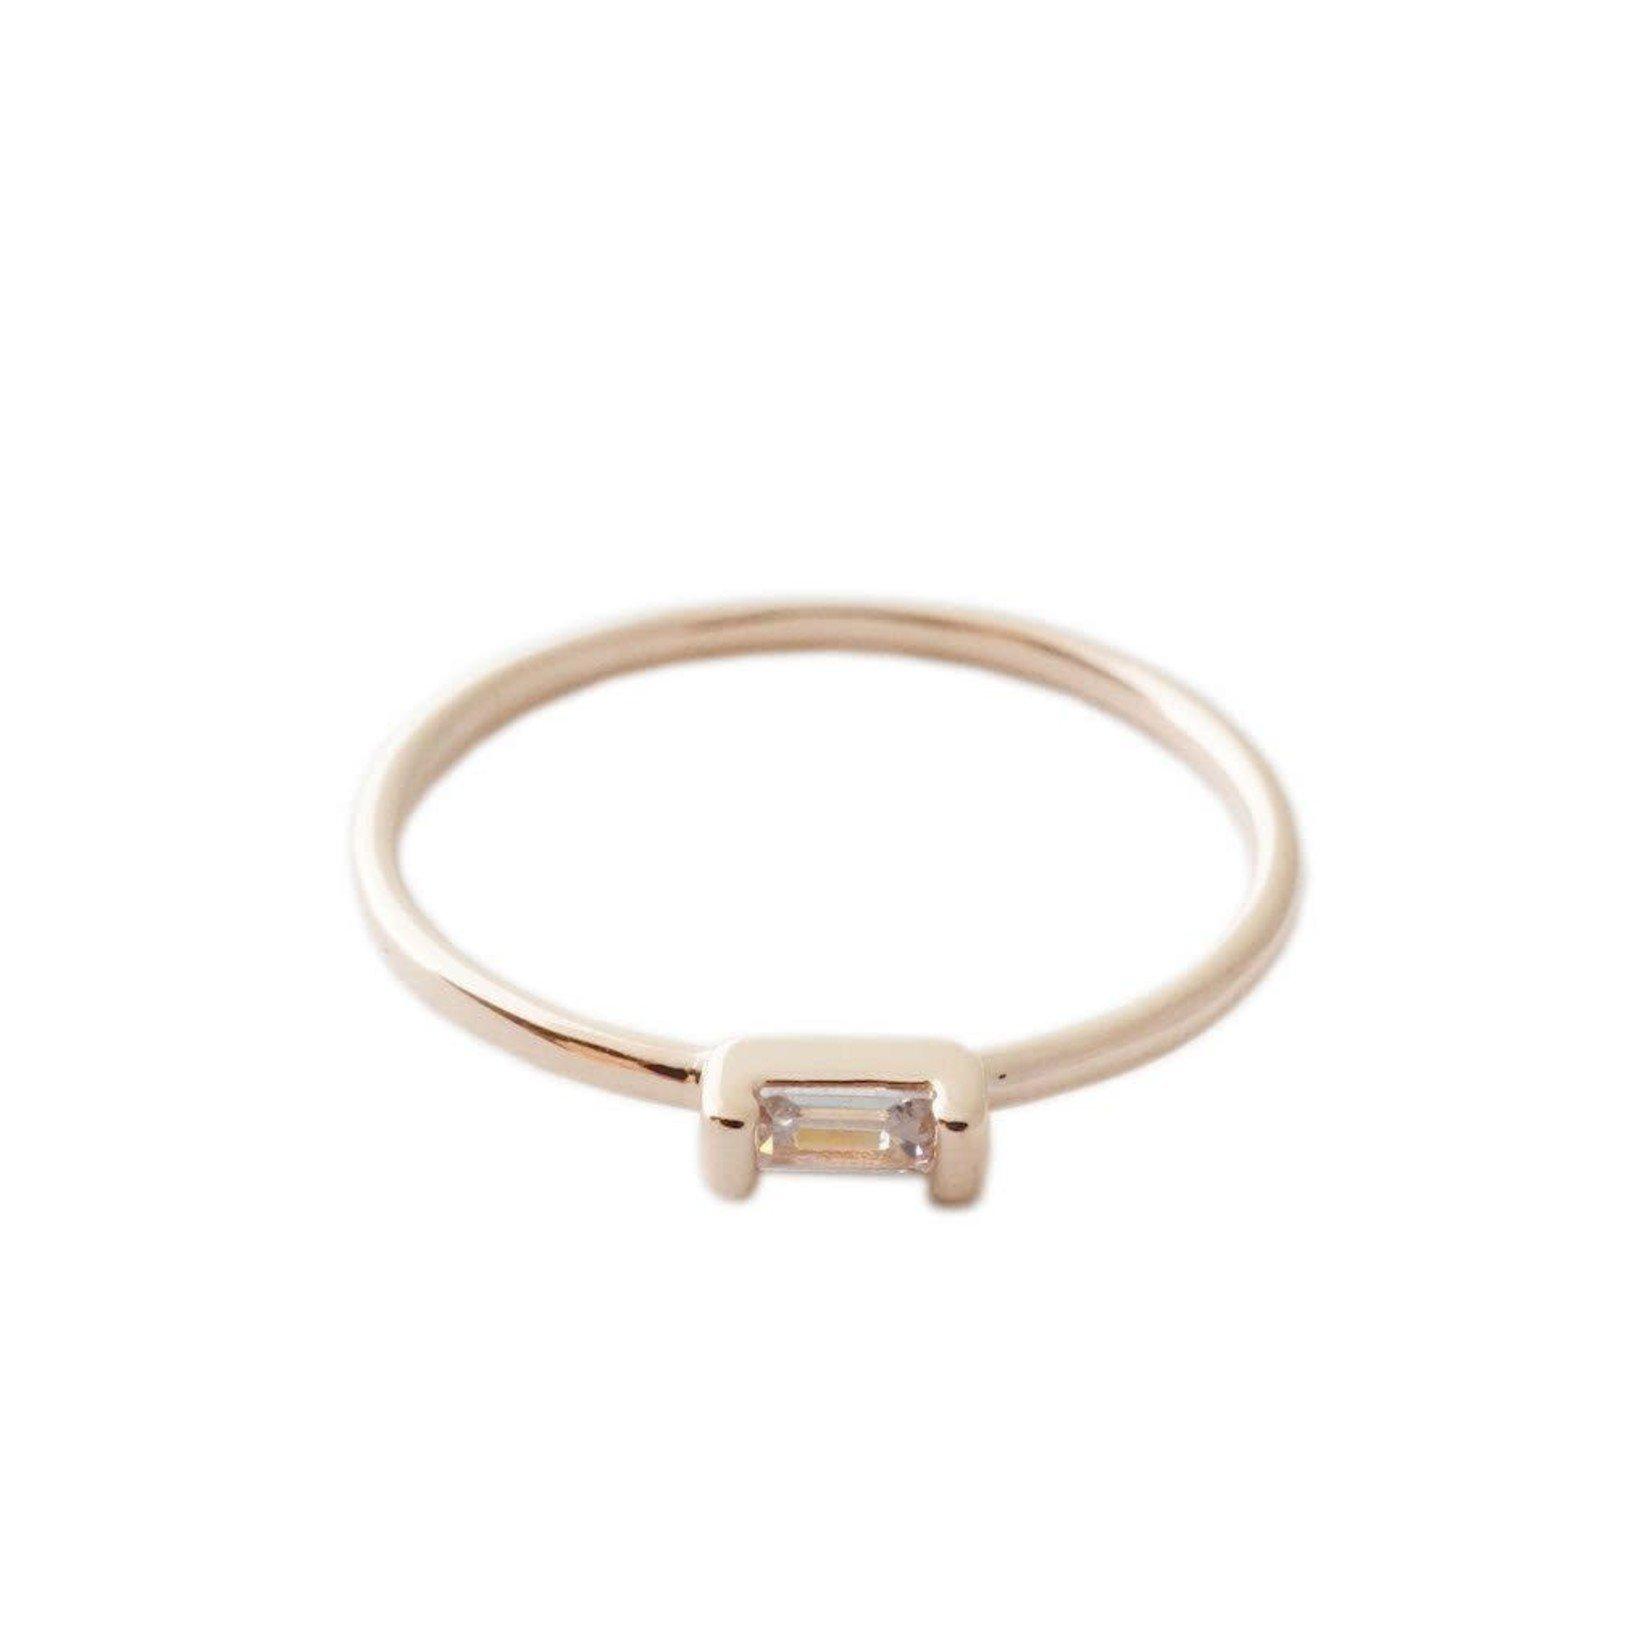 Honeycat Jewelry Honeycat Crystal Baguette Ring Rose Gold